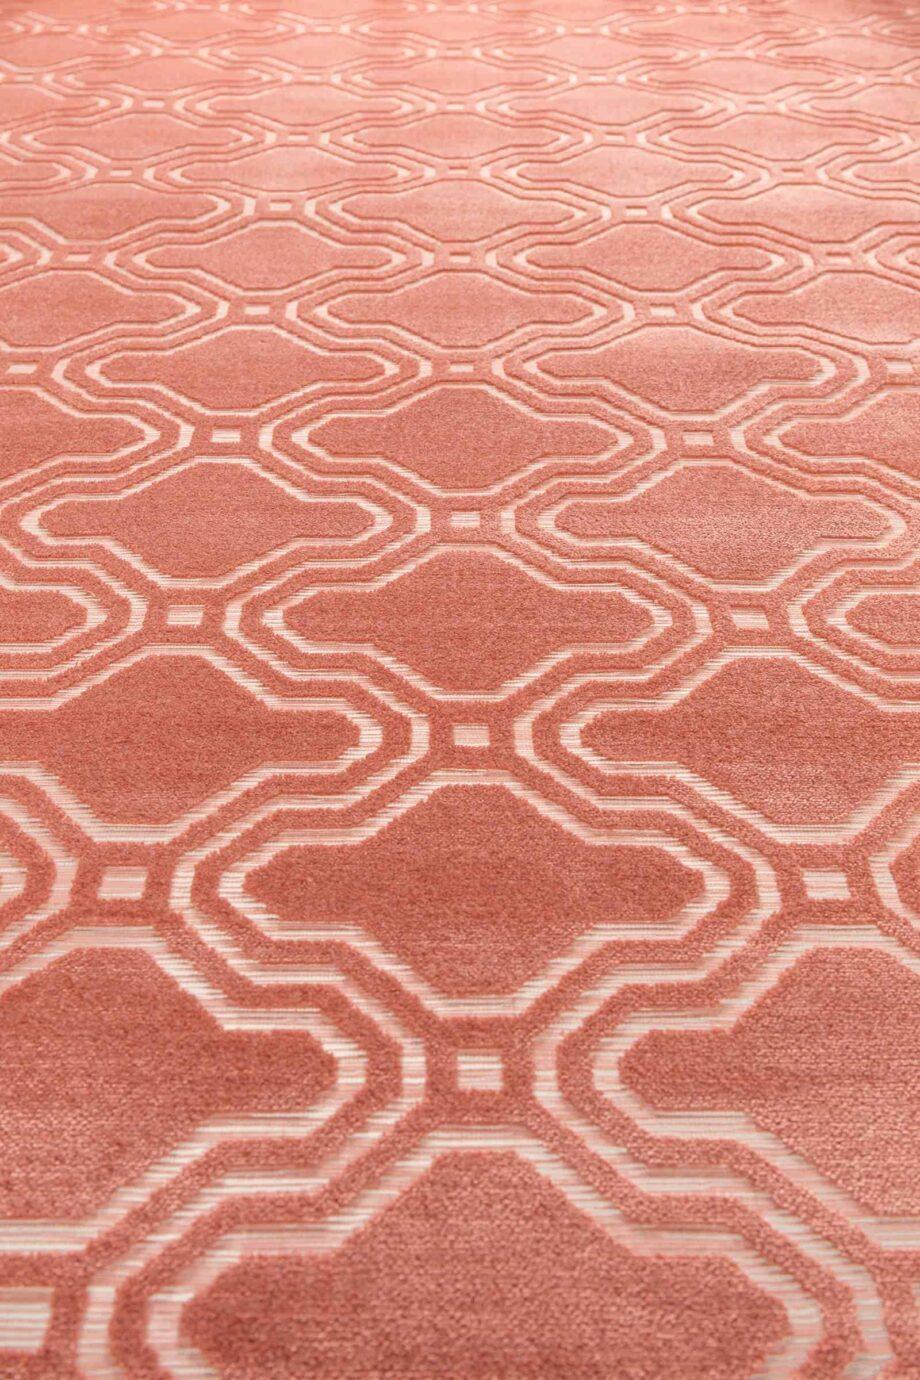 Feike tapijt Designshopp roze 2